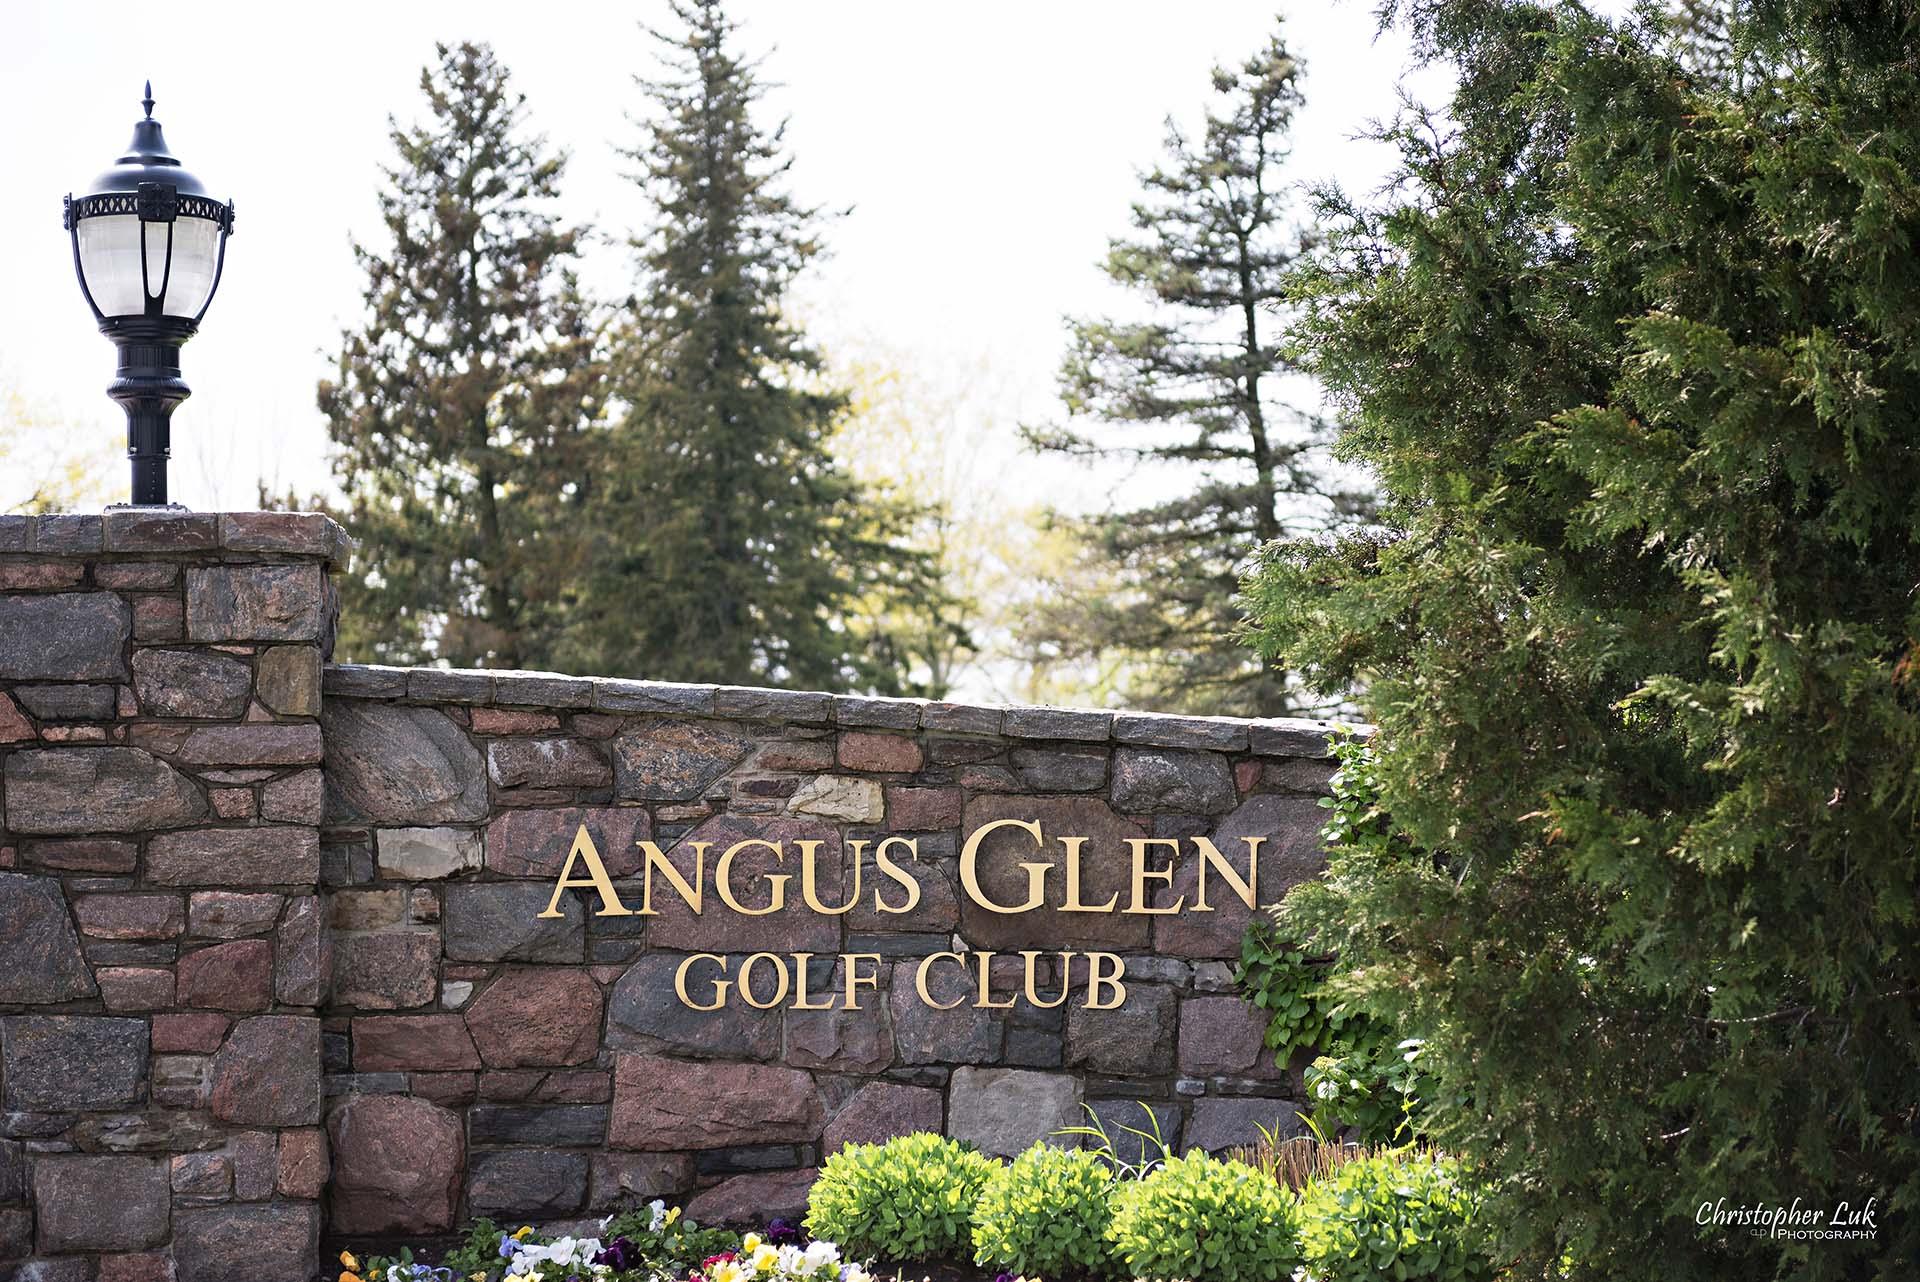 Christopher Luk Toronto Wedding Photographer Angus Glen Golf Club Markham Entrance Stone Sign Logo